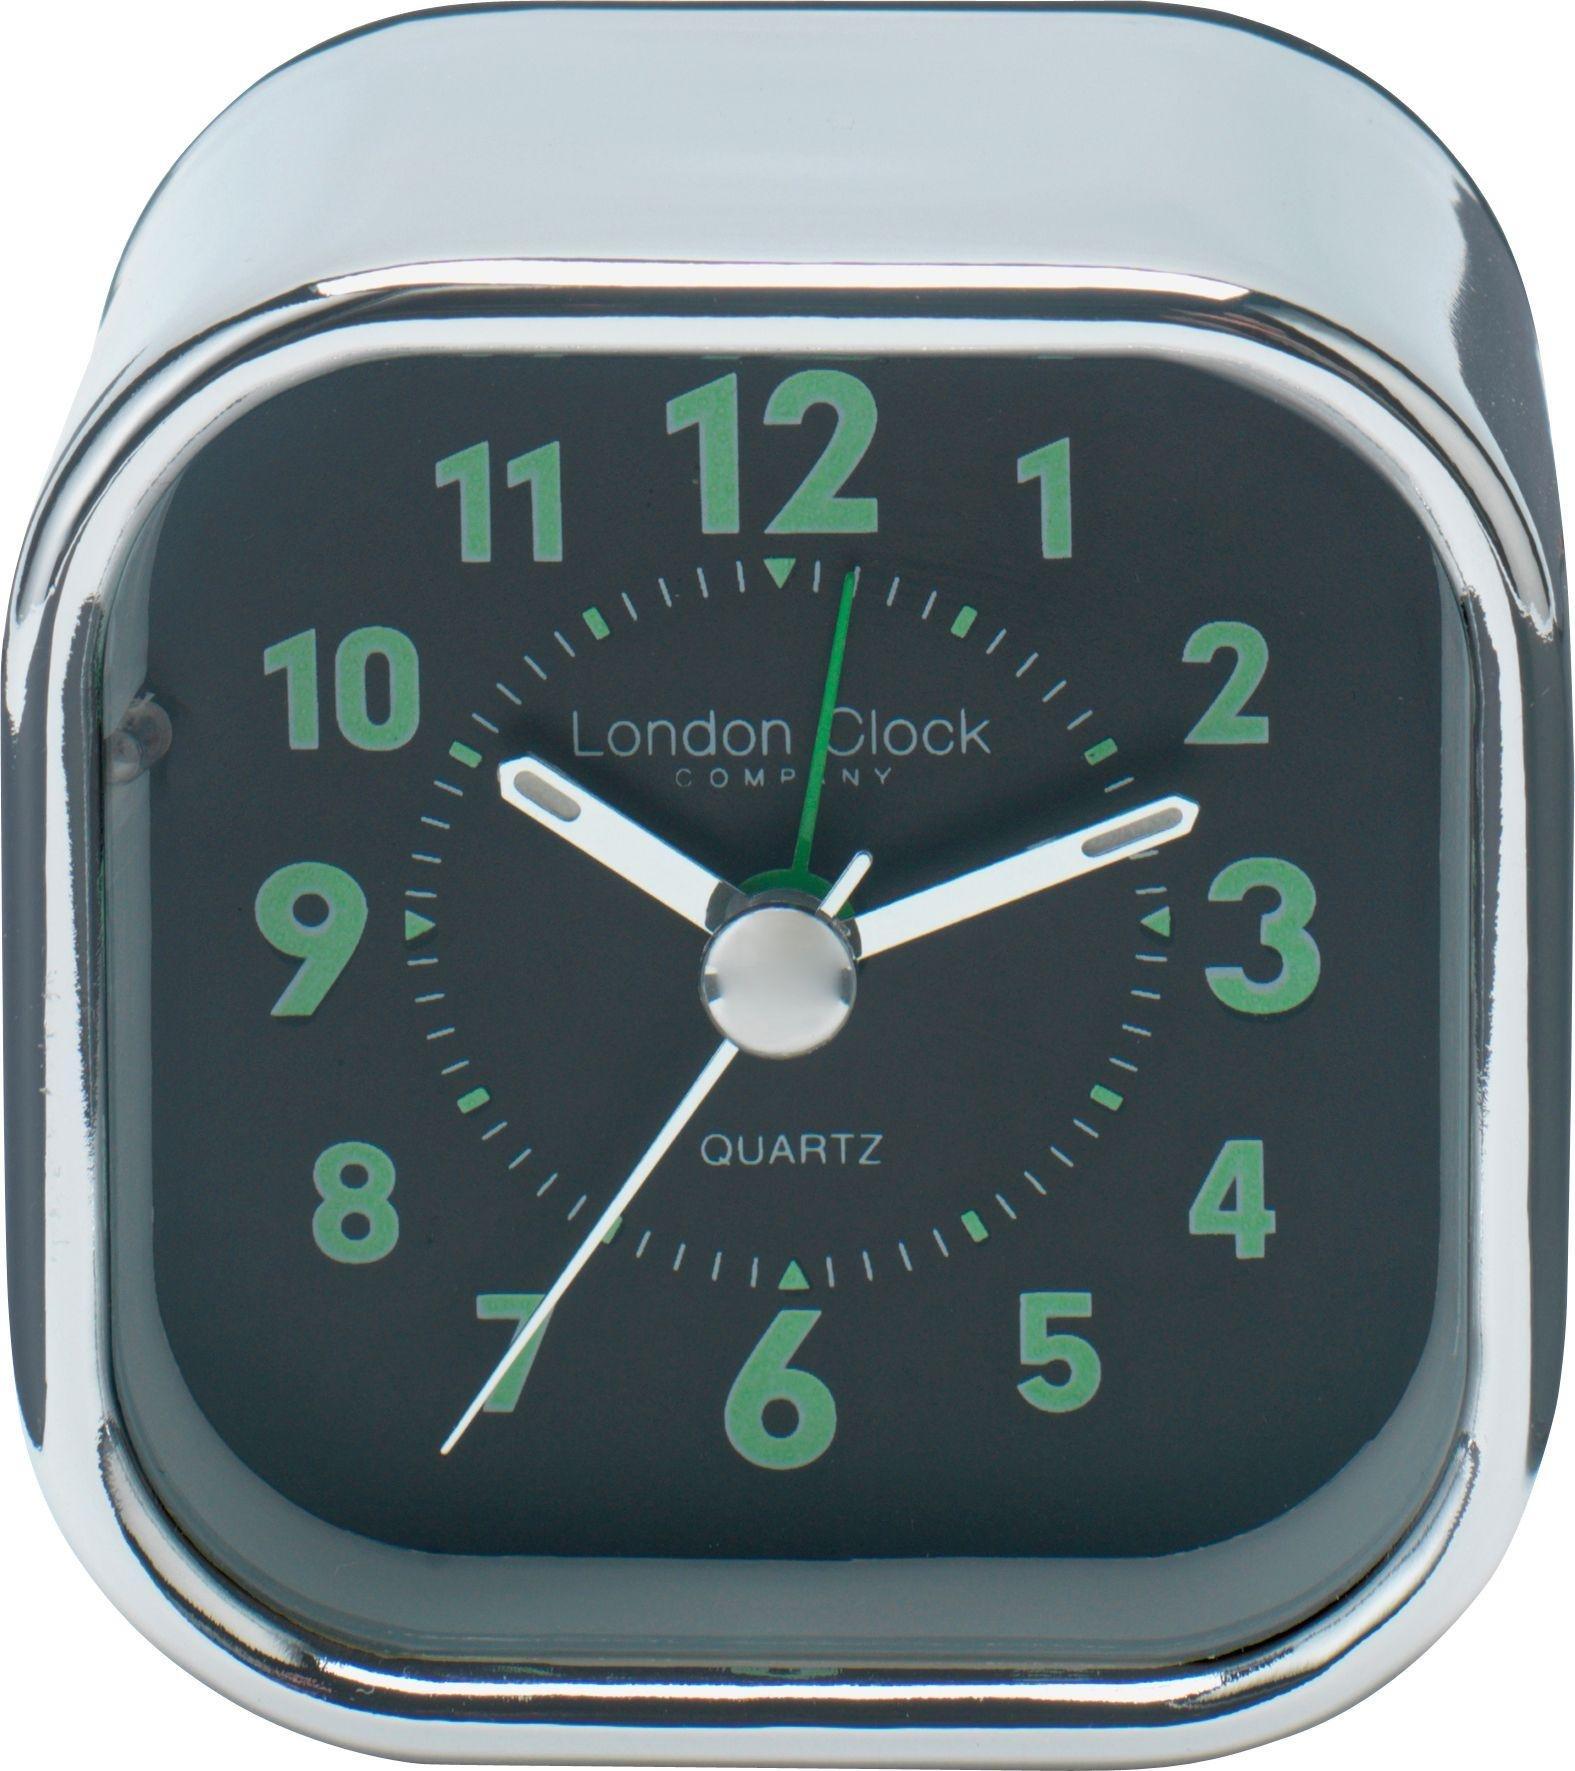 London Clock Company Lumibrite Alarm Clock